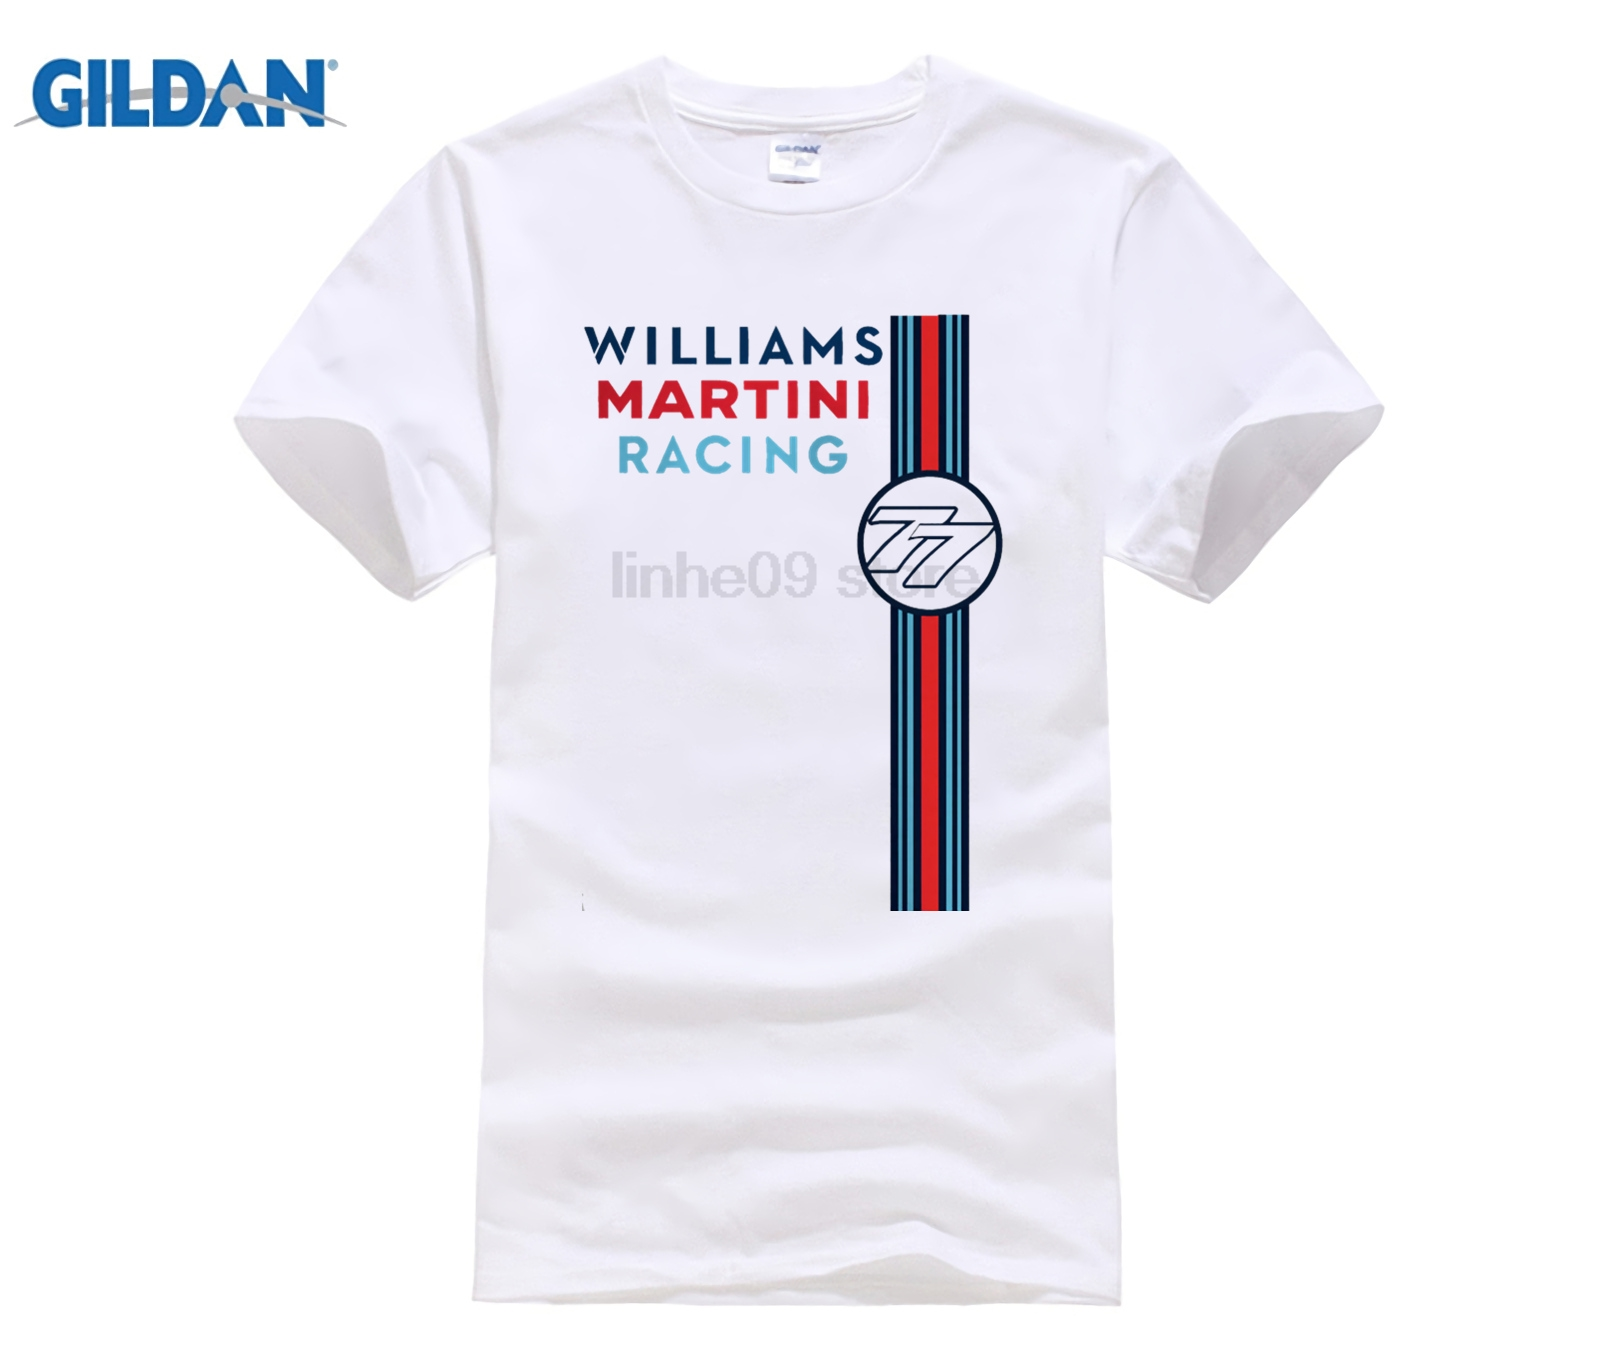 3792ece7c3a5d 2019 caliente de verano de los hombres T camisa moda película Williams  Martini Racer 2015 Bottas